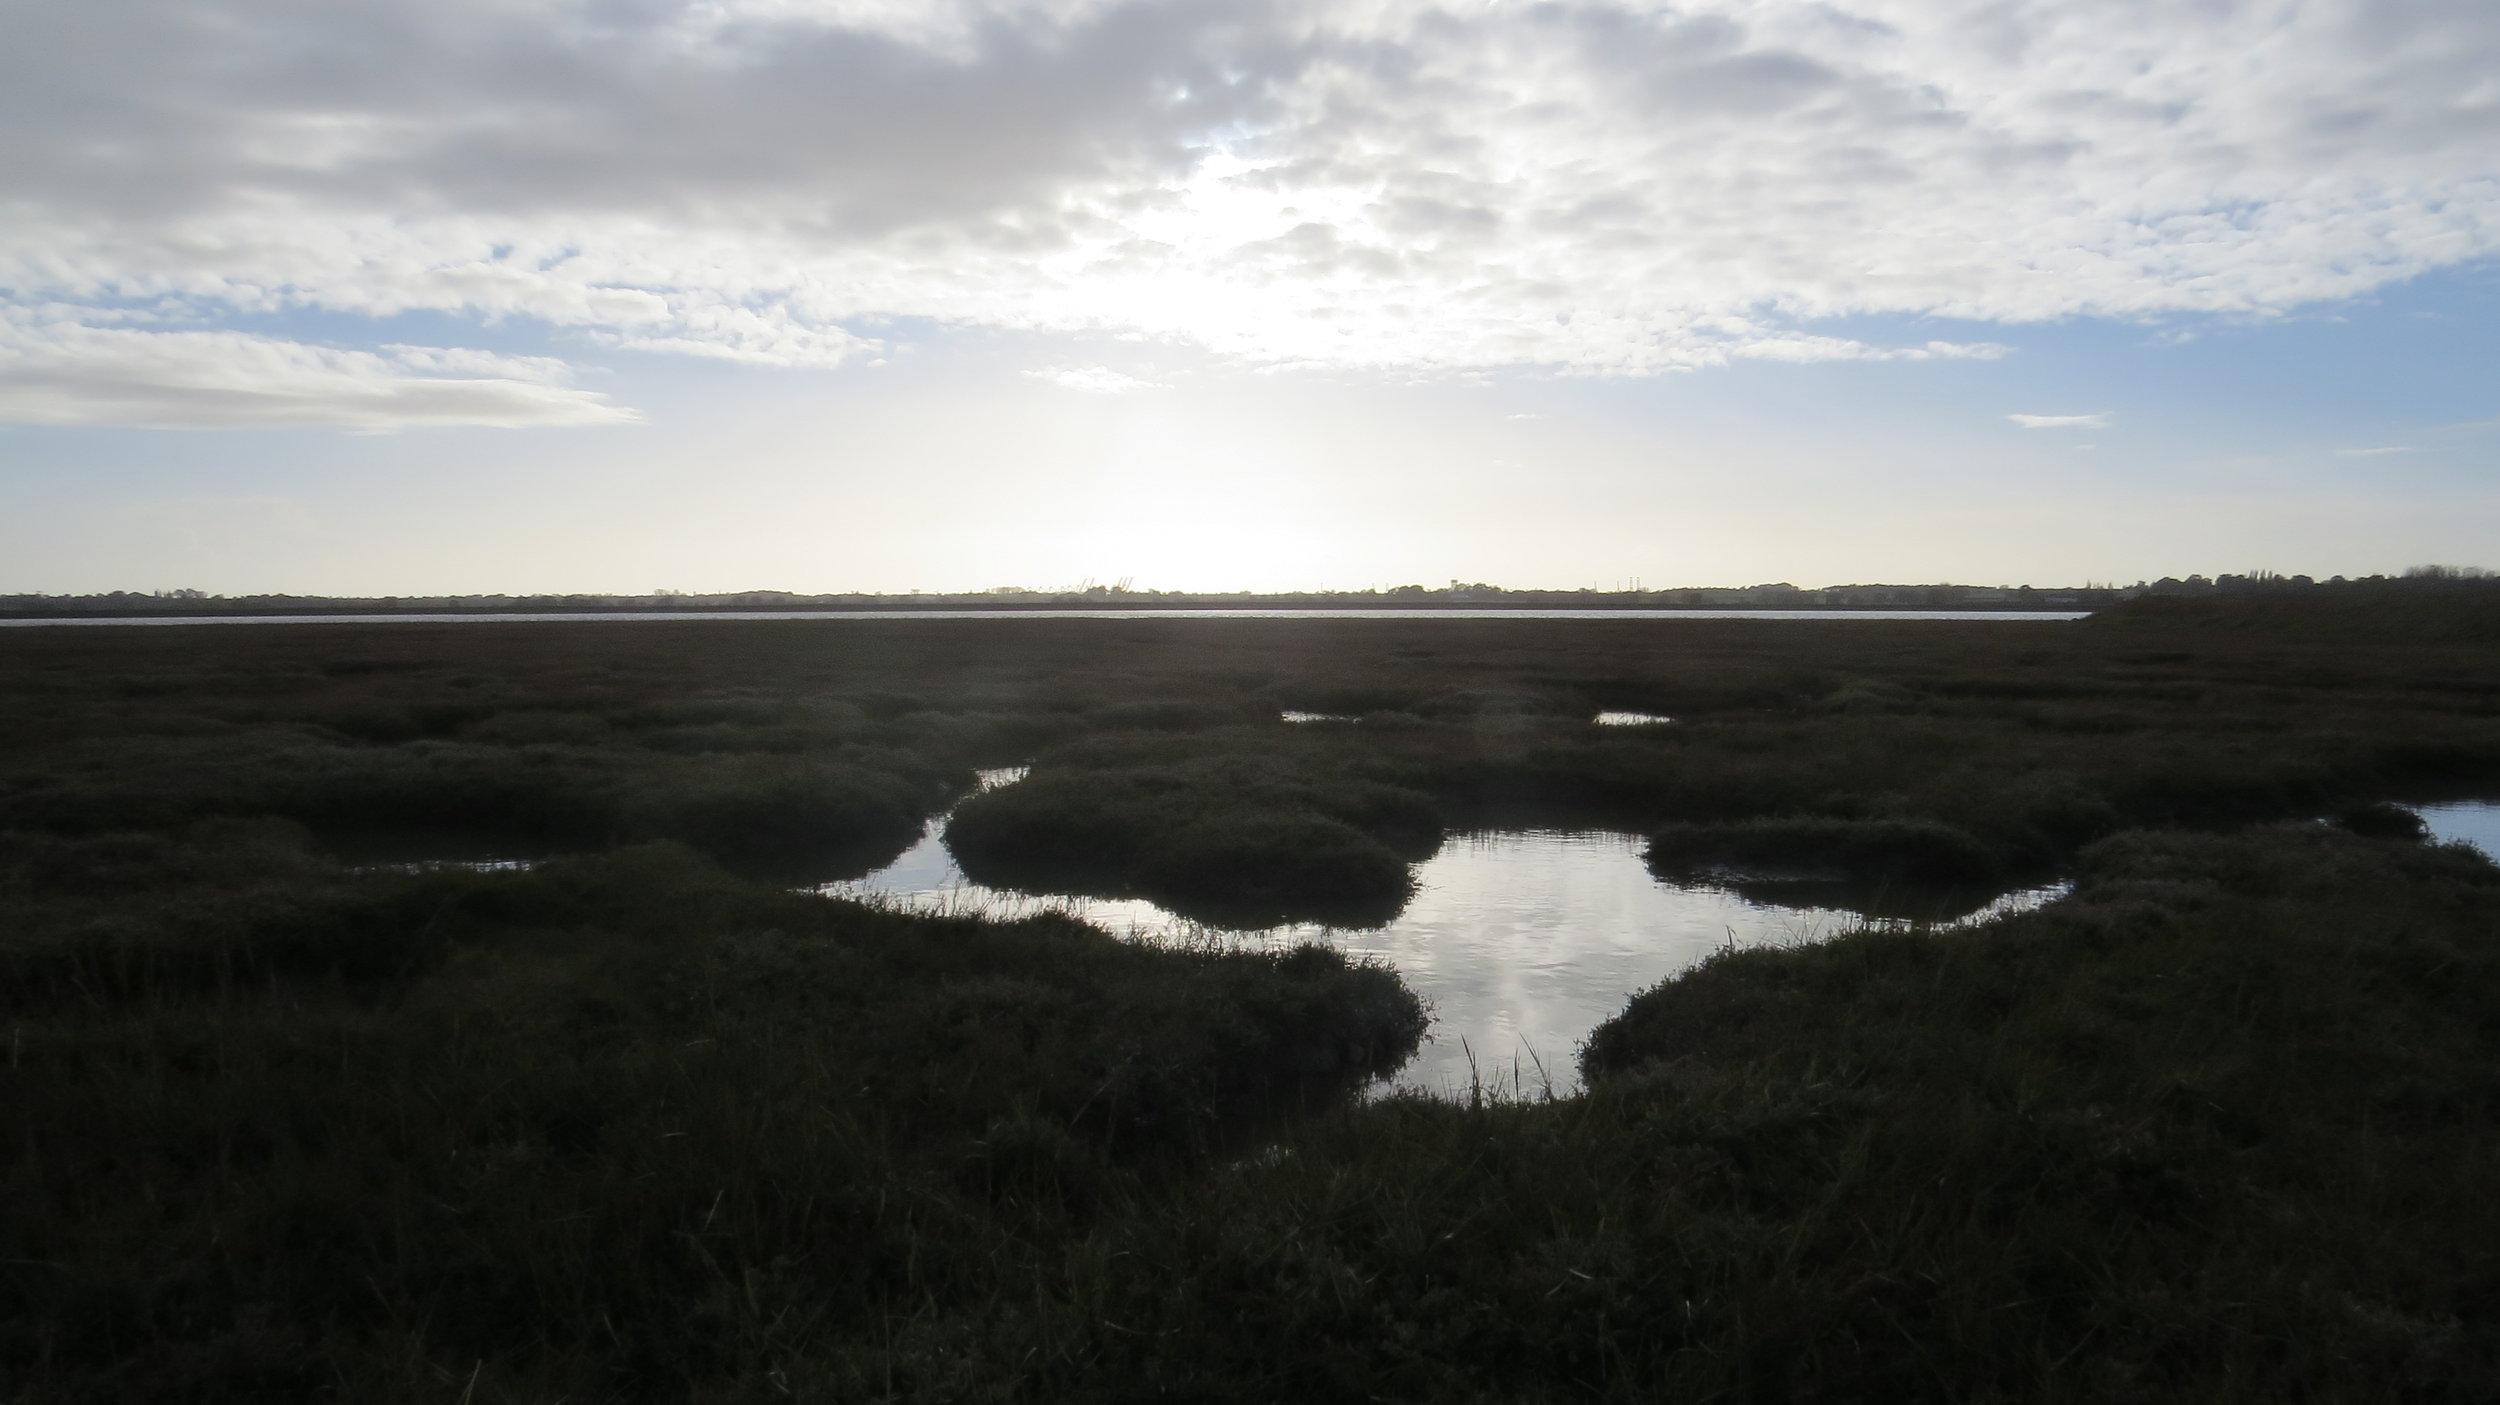 Mud Flats/Marshes